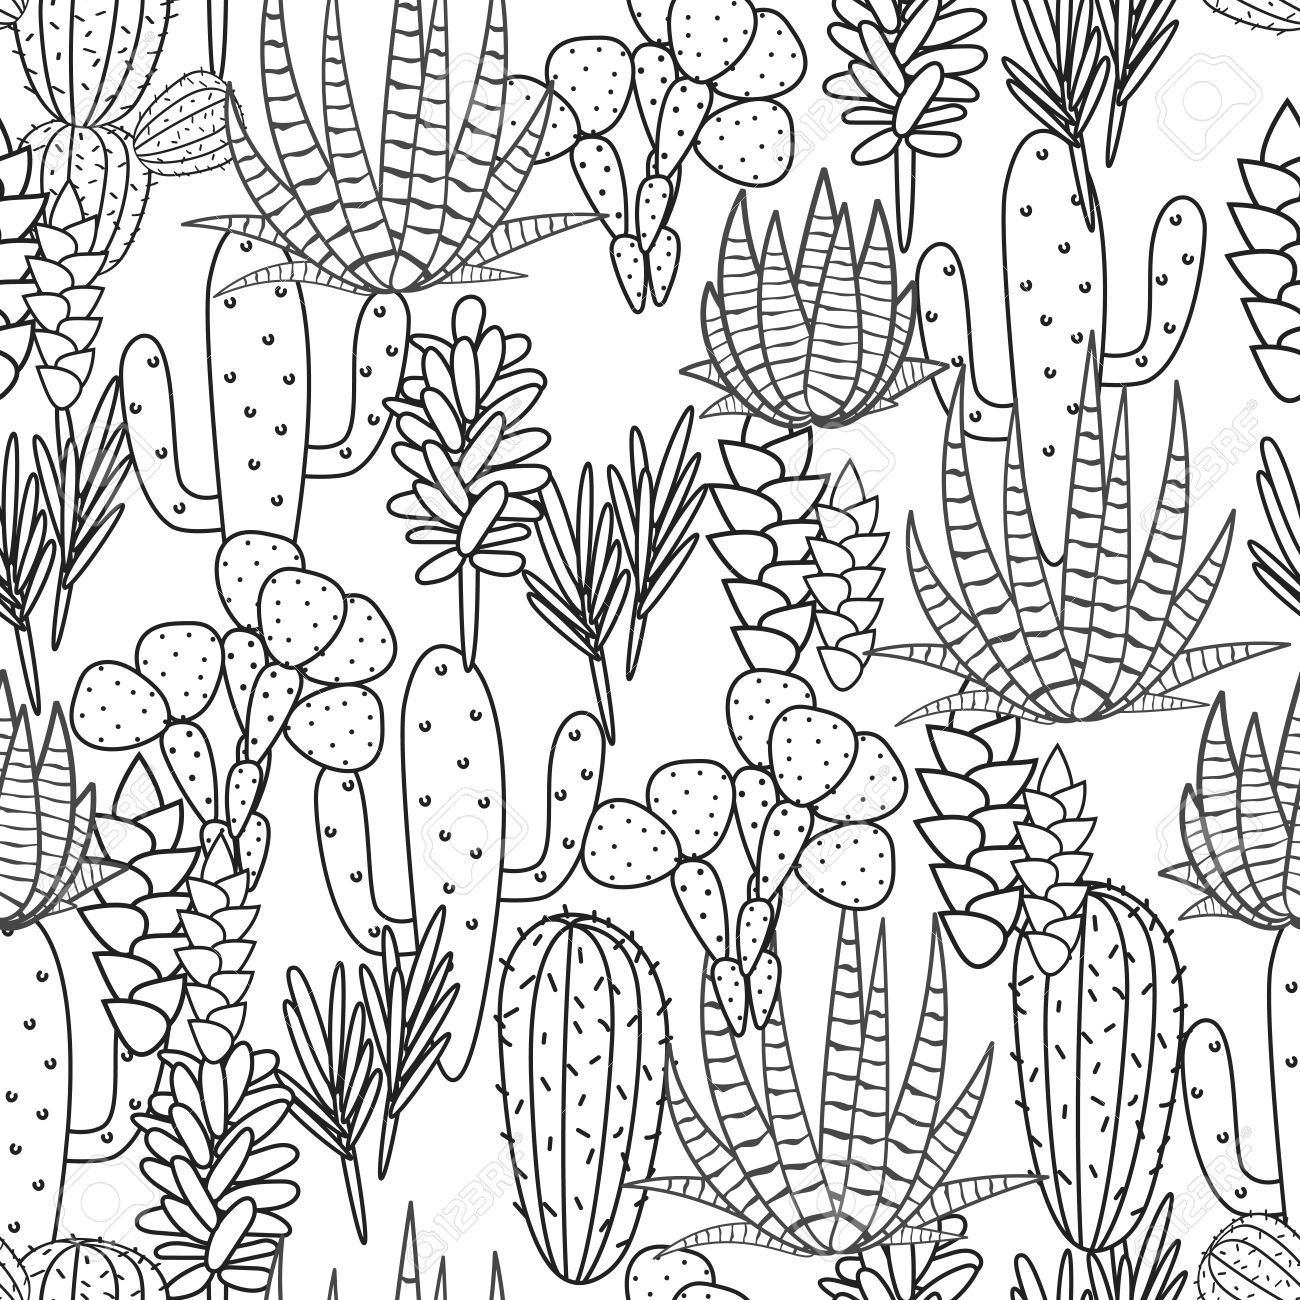 Sukkulente Kakteen Pflanzen Vektor Nahtlose Muster. Botanischer ...